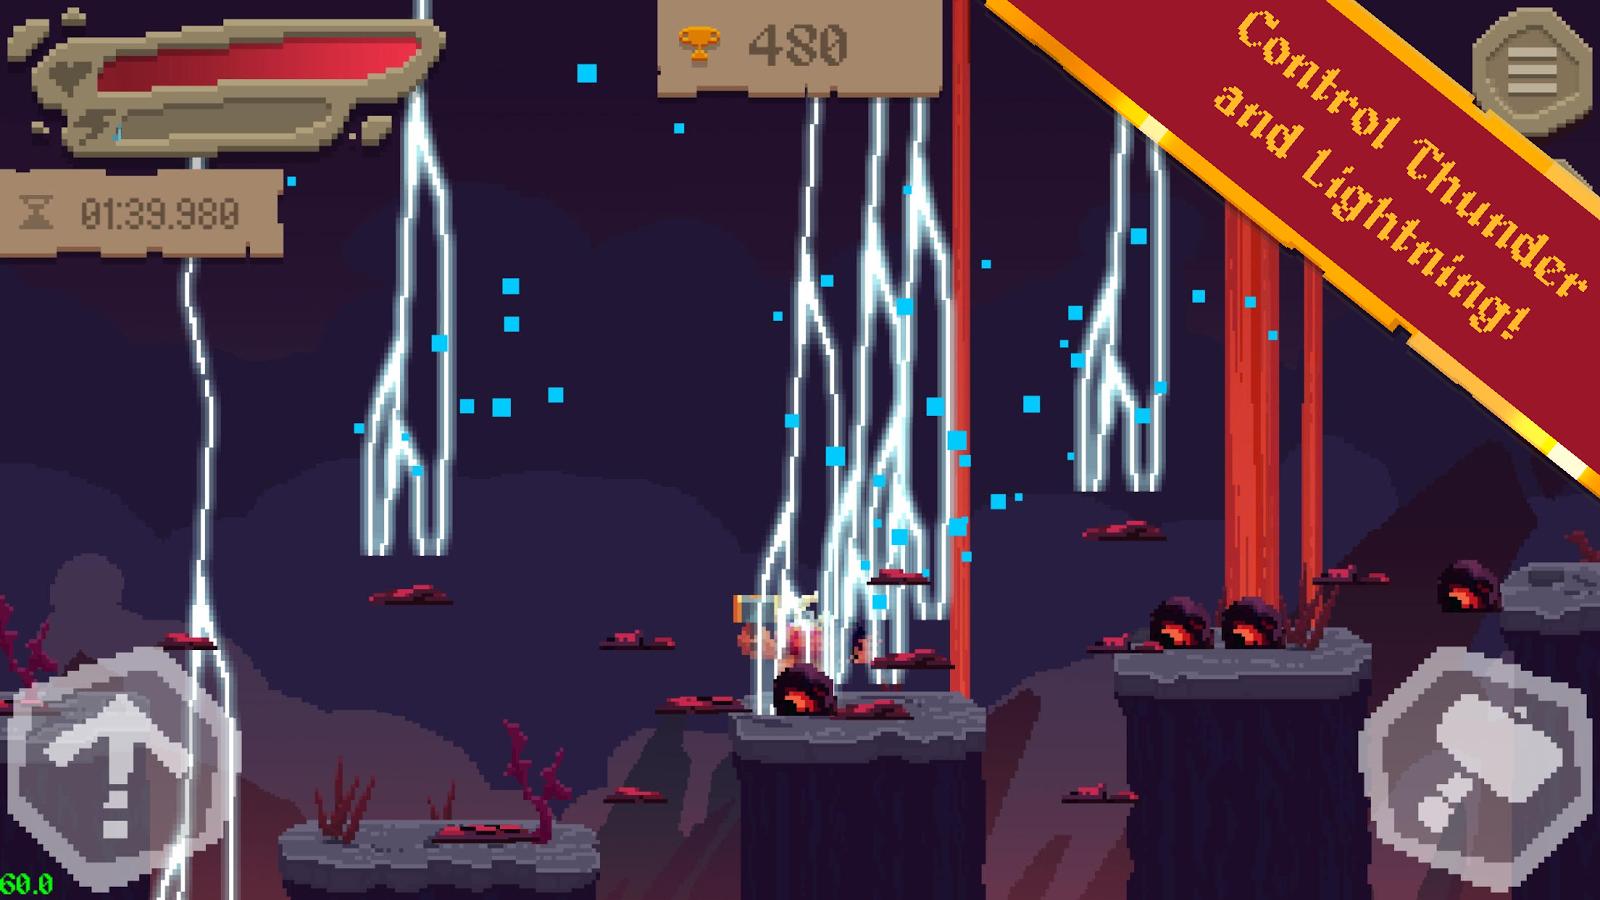 Amon Amarth: Mobile Video Game - -